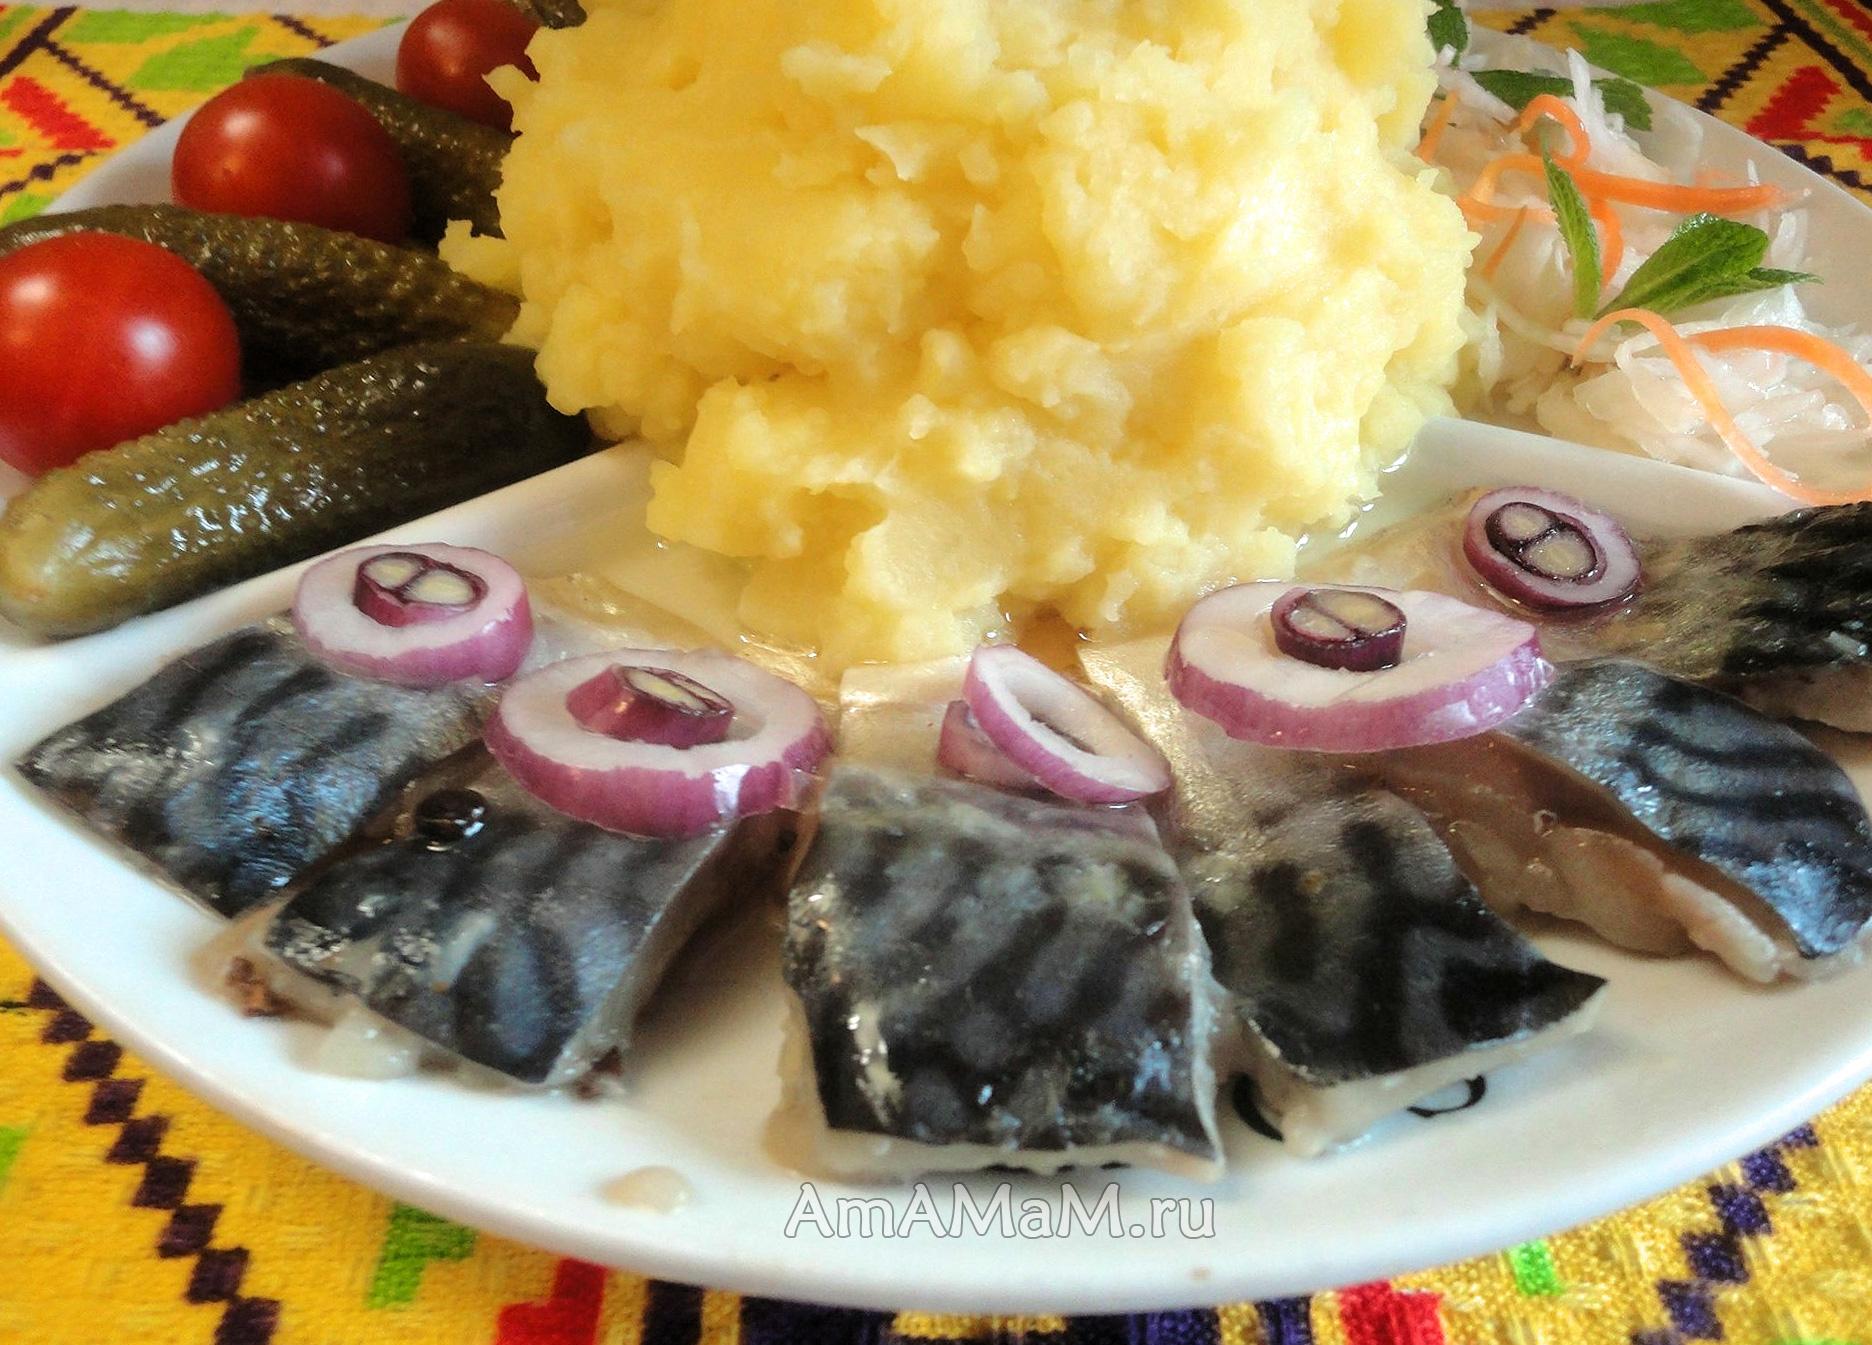 Засолка сельди в домашних условиях: рецепт Чудо-Повар 84